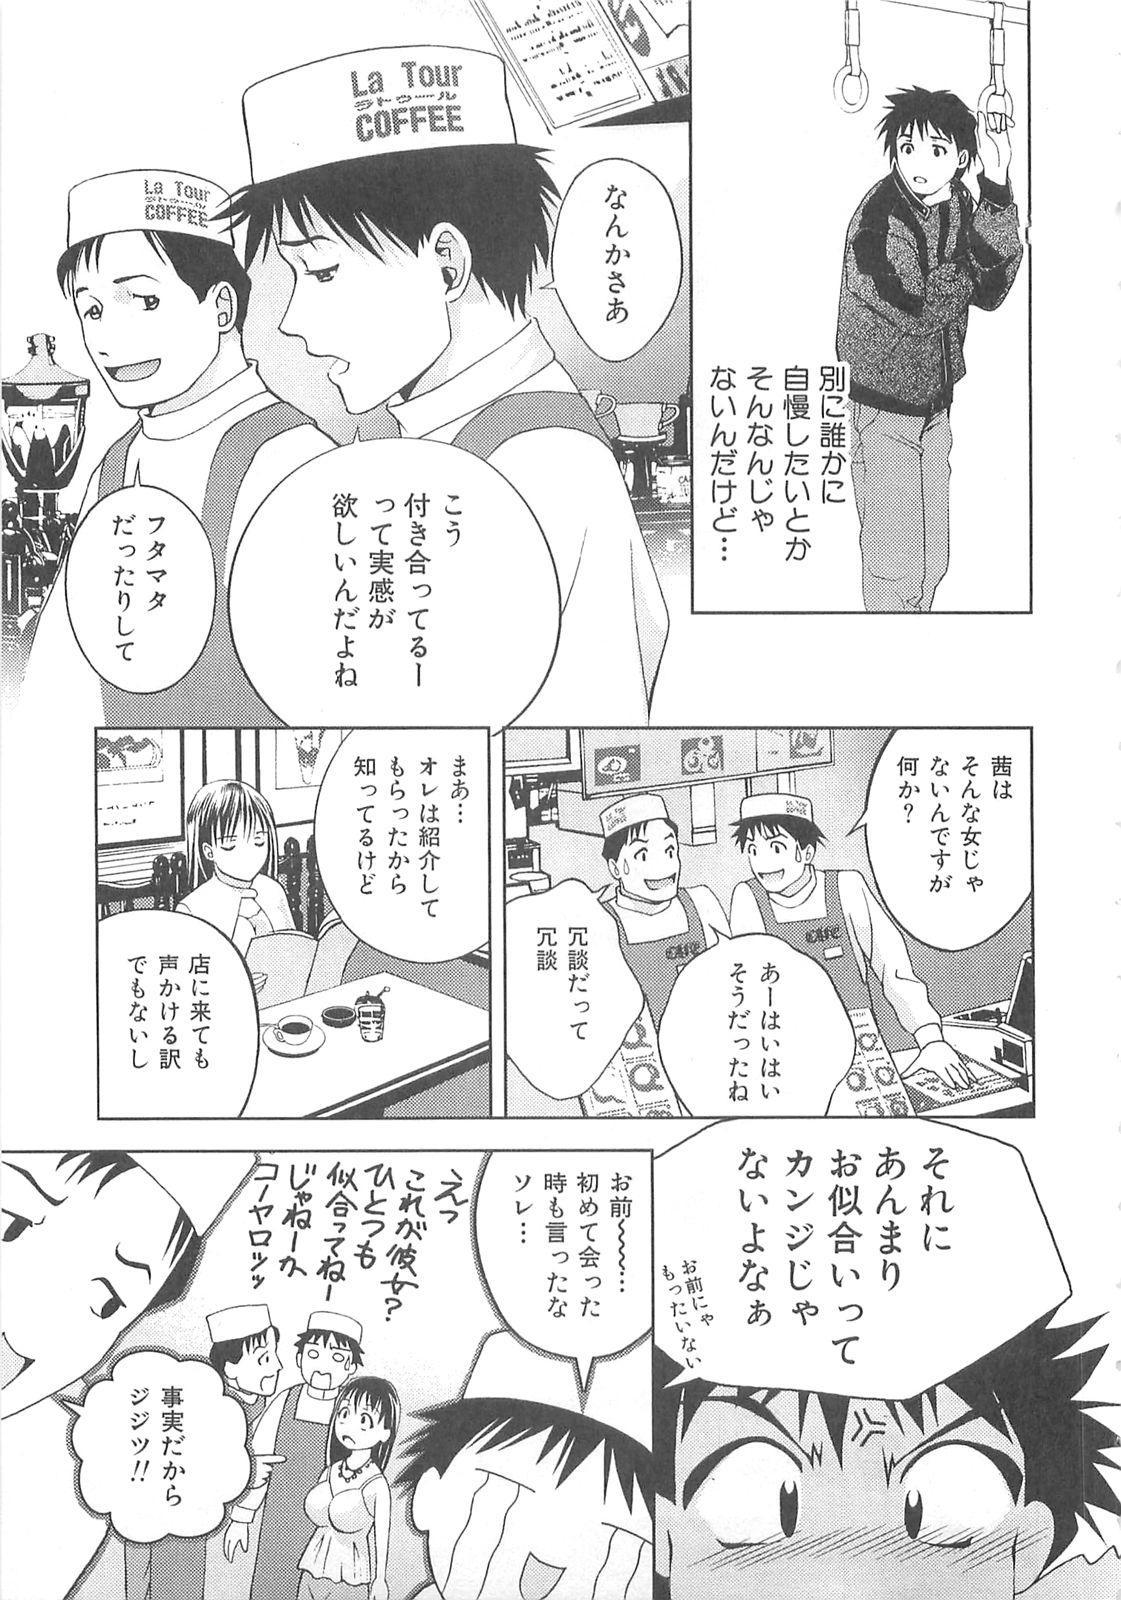 Tenshi no Kyuu - Angel's Pretty Hip 11